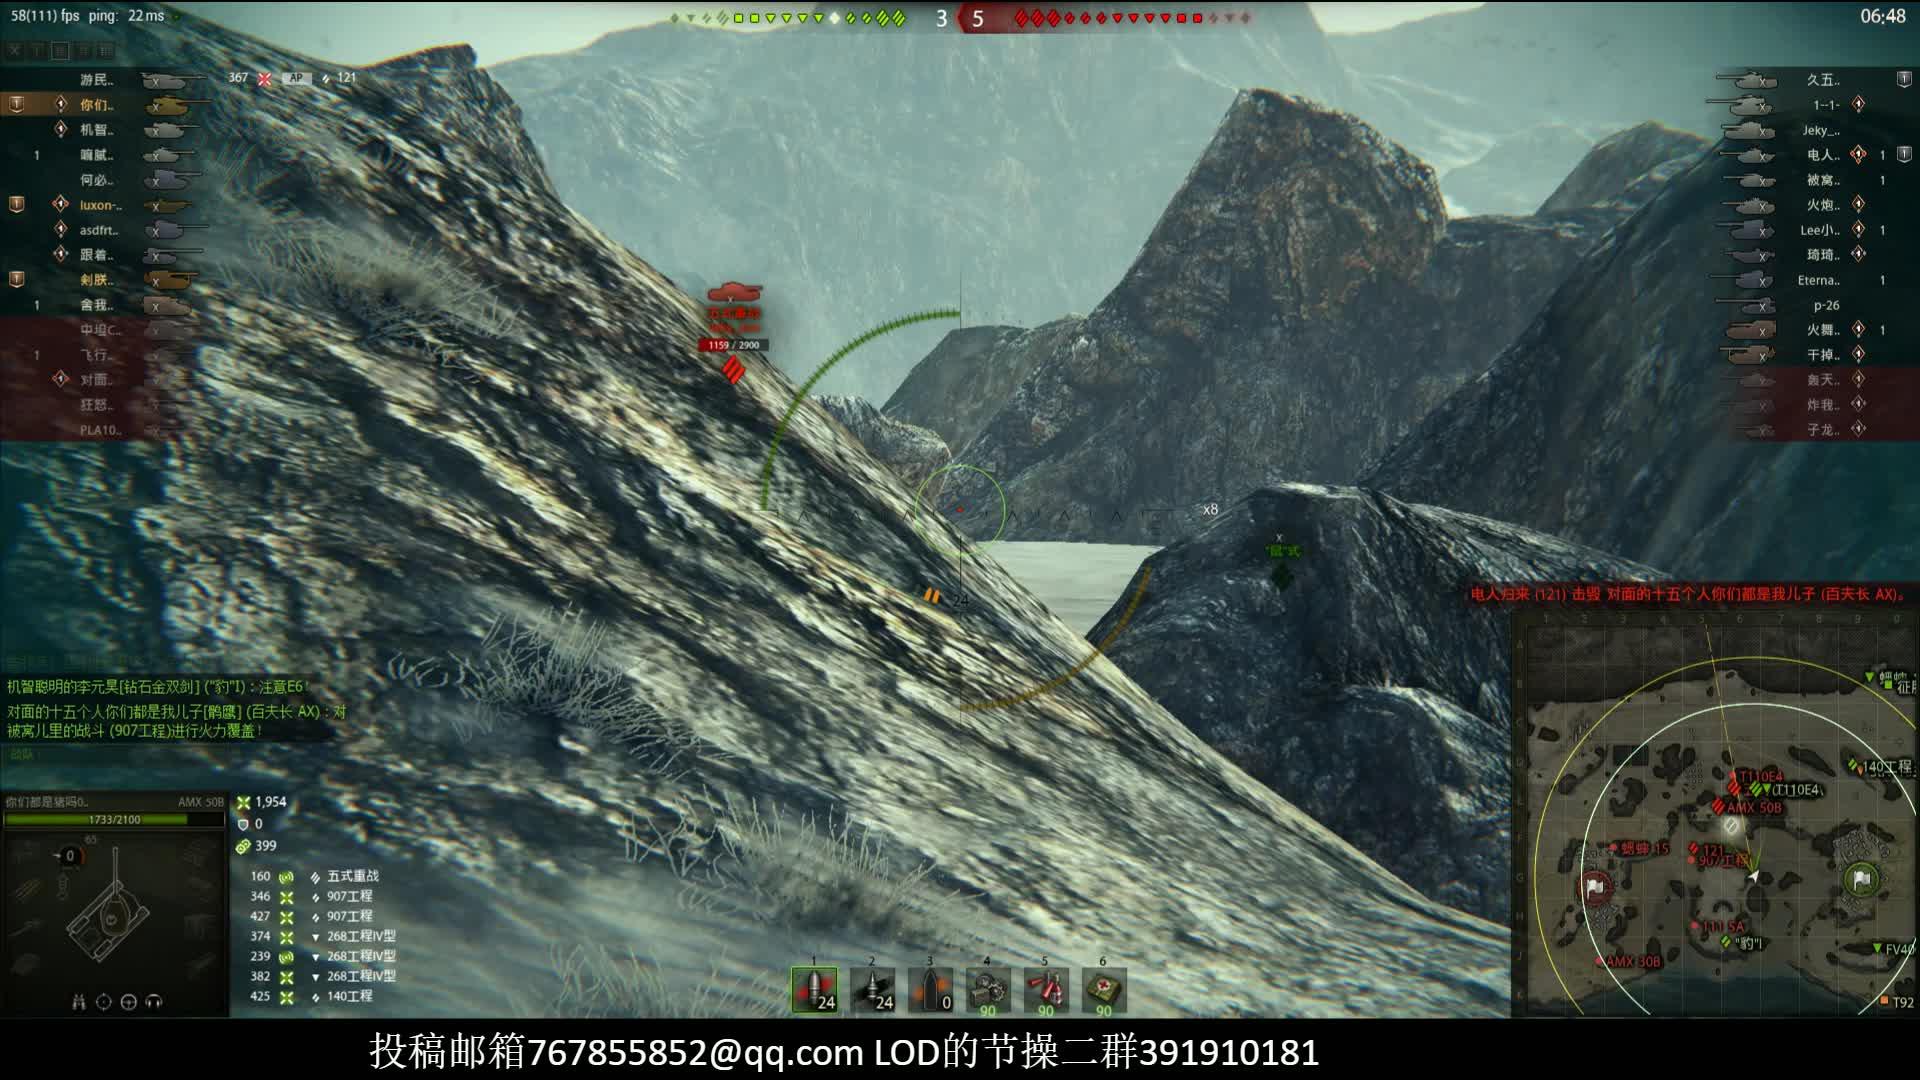 【WO】坦克世界LOD解说 B哥最后一秒获胜